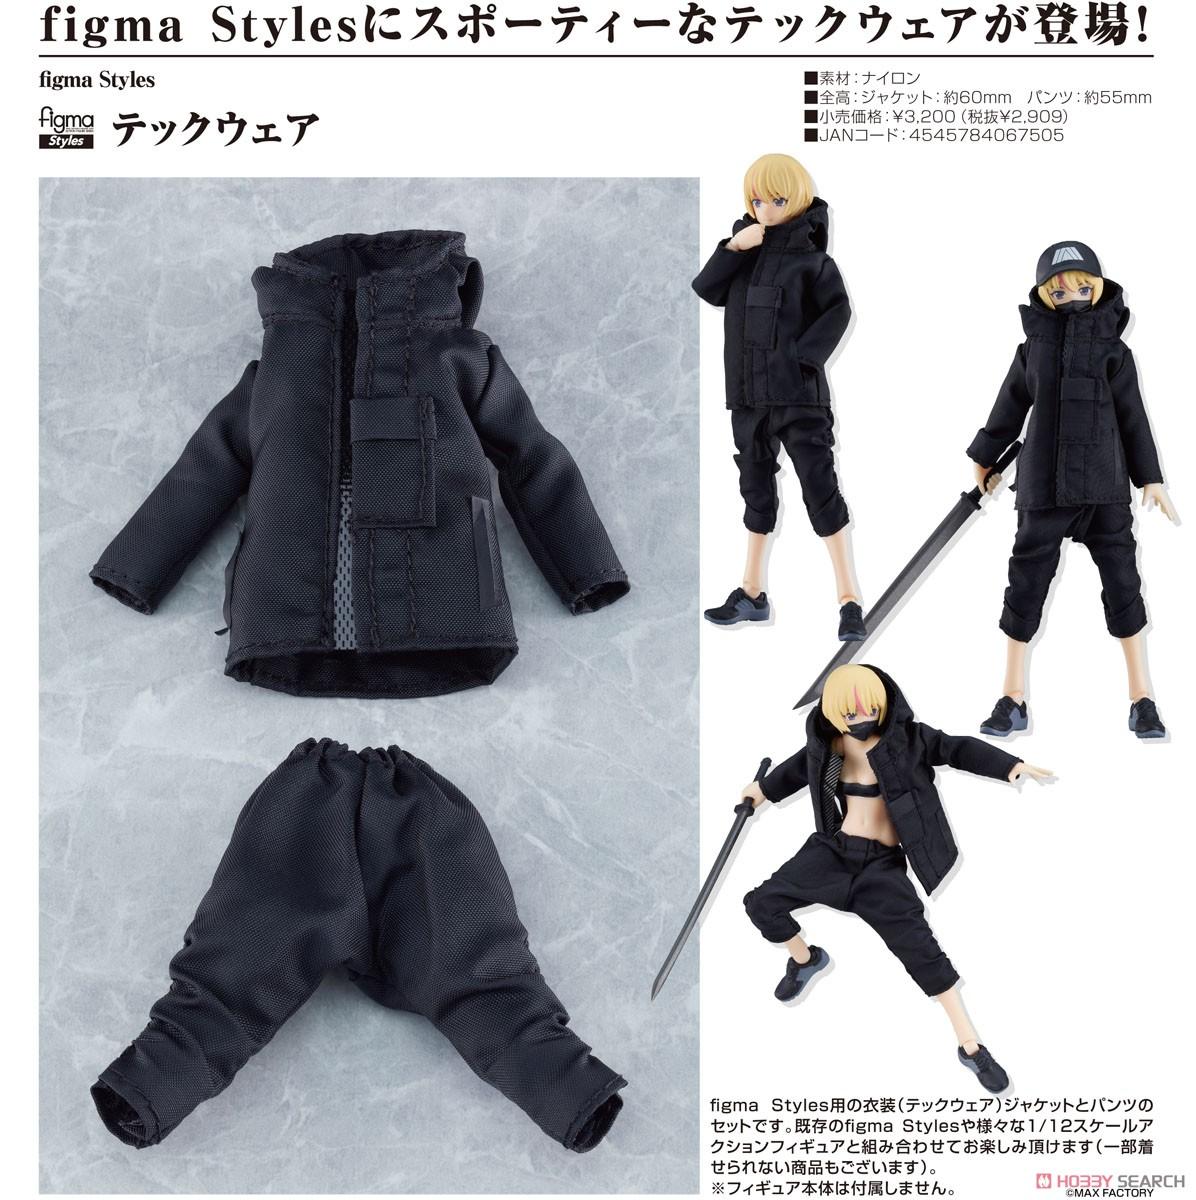 figma styles『女性body(ユウキ)with テックウェアコーデ』可動フィギュア-012